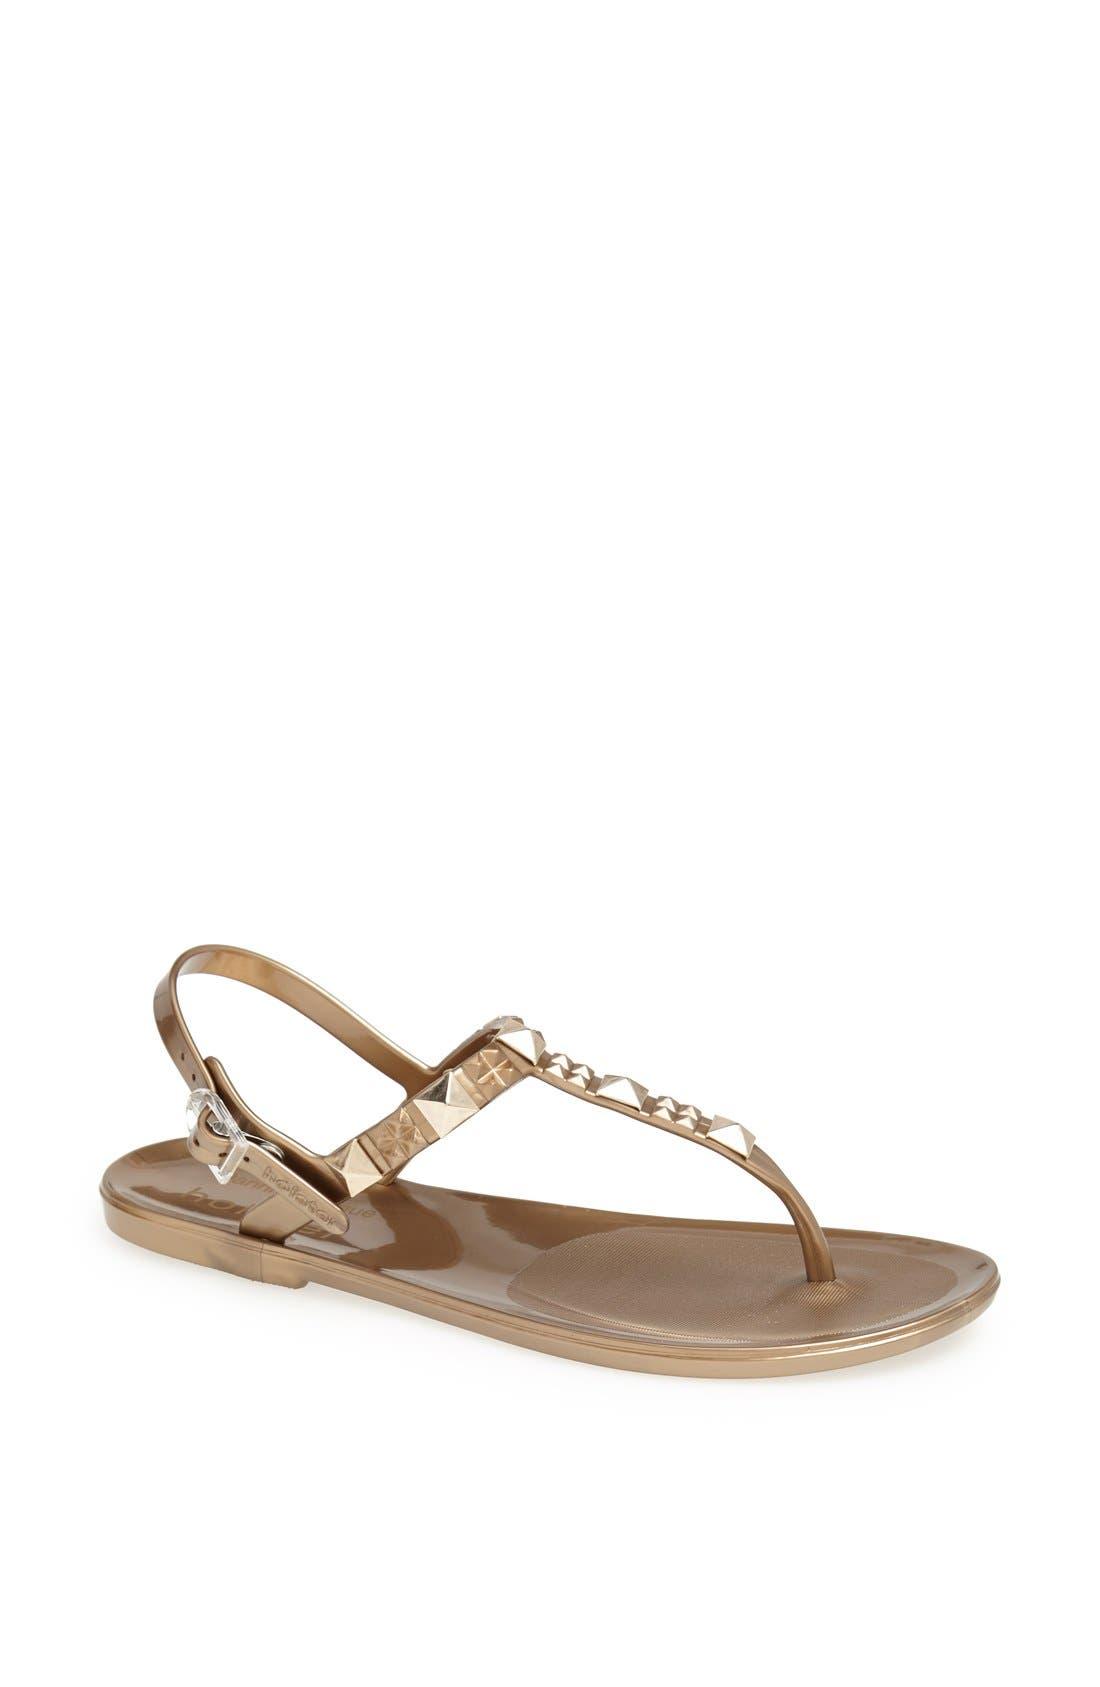 Main Image - Holster Fashion 'Rockstar' Jelly Thong Sandal